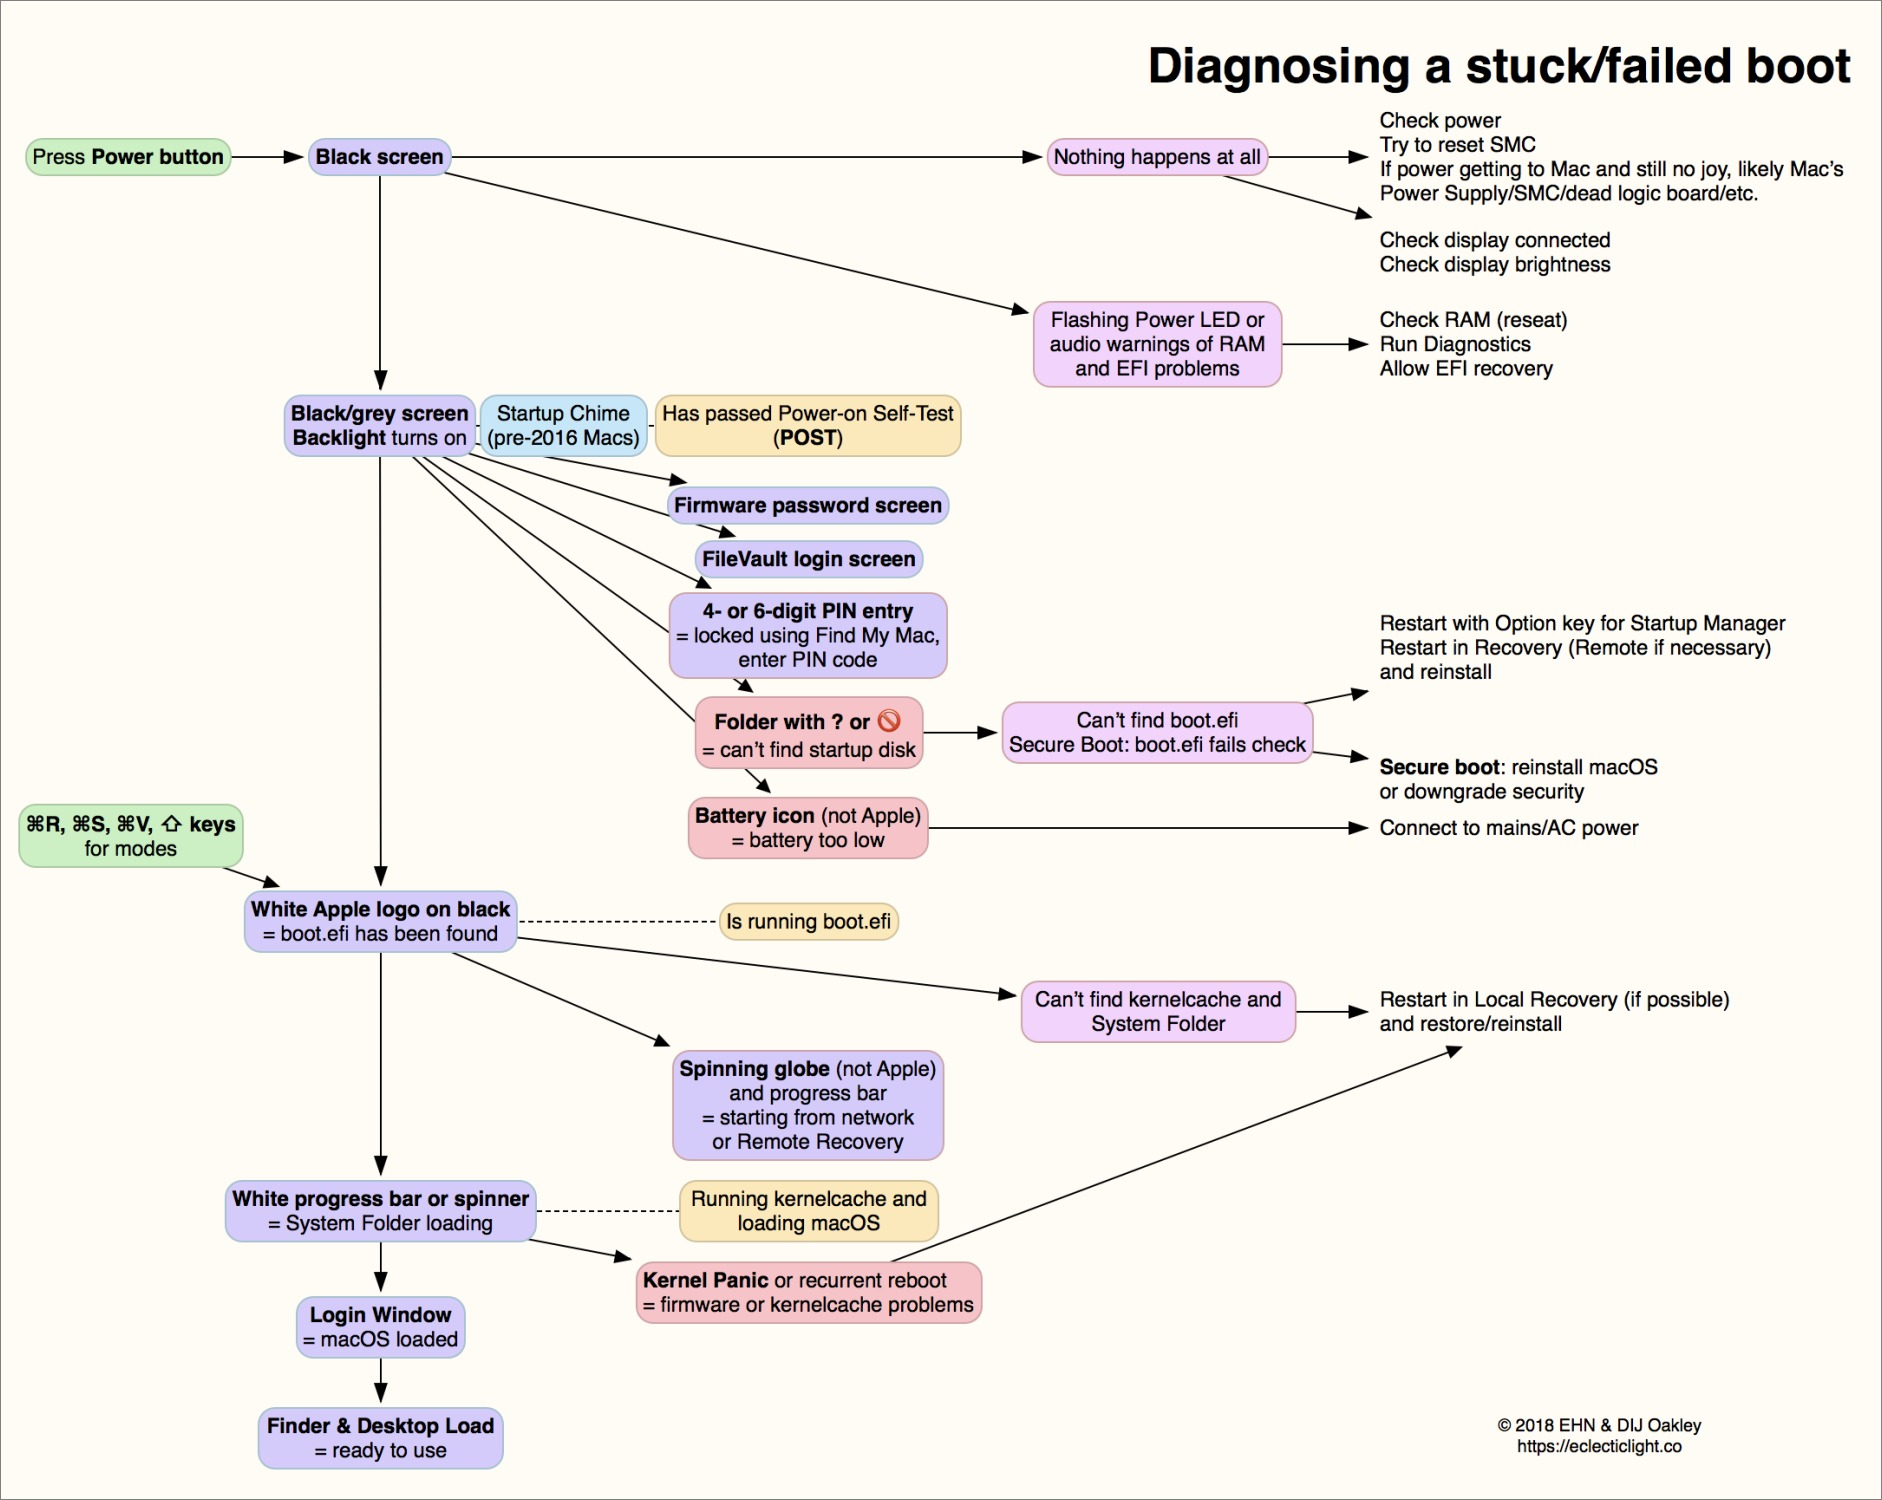 Diagnose Mac Boot Problems with Howard Oakley's Diagram - TidBITS